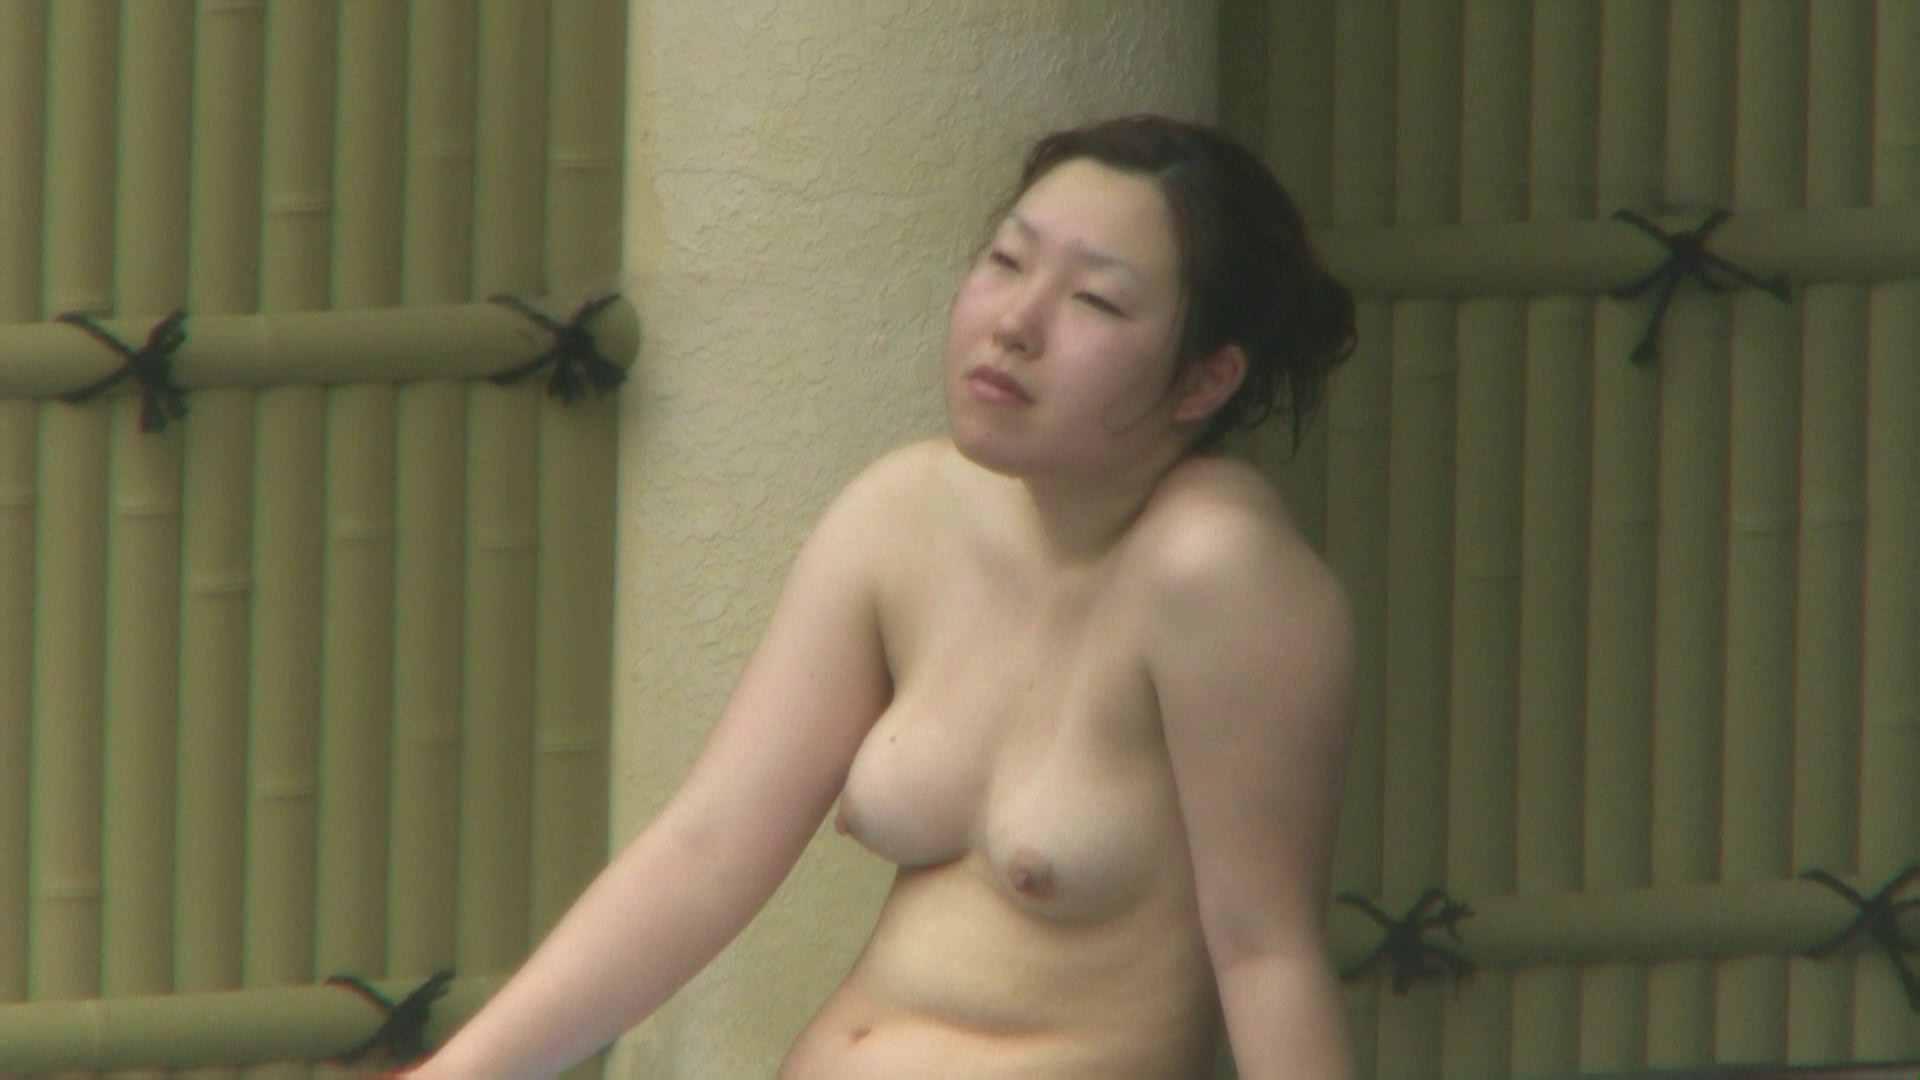 Aquaな露天風呂Vol.72【VIP限定】 0 | 0  47連発 13